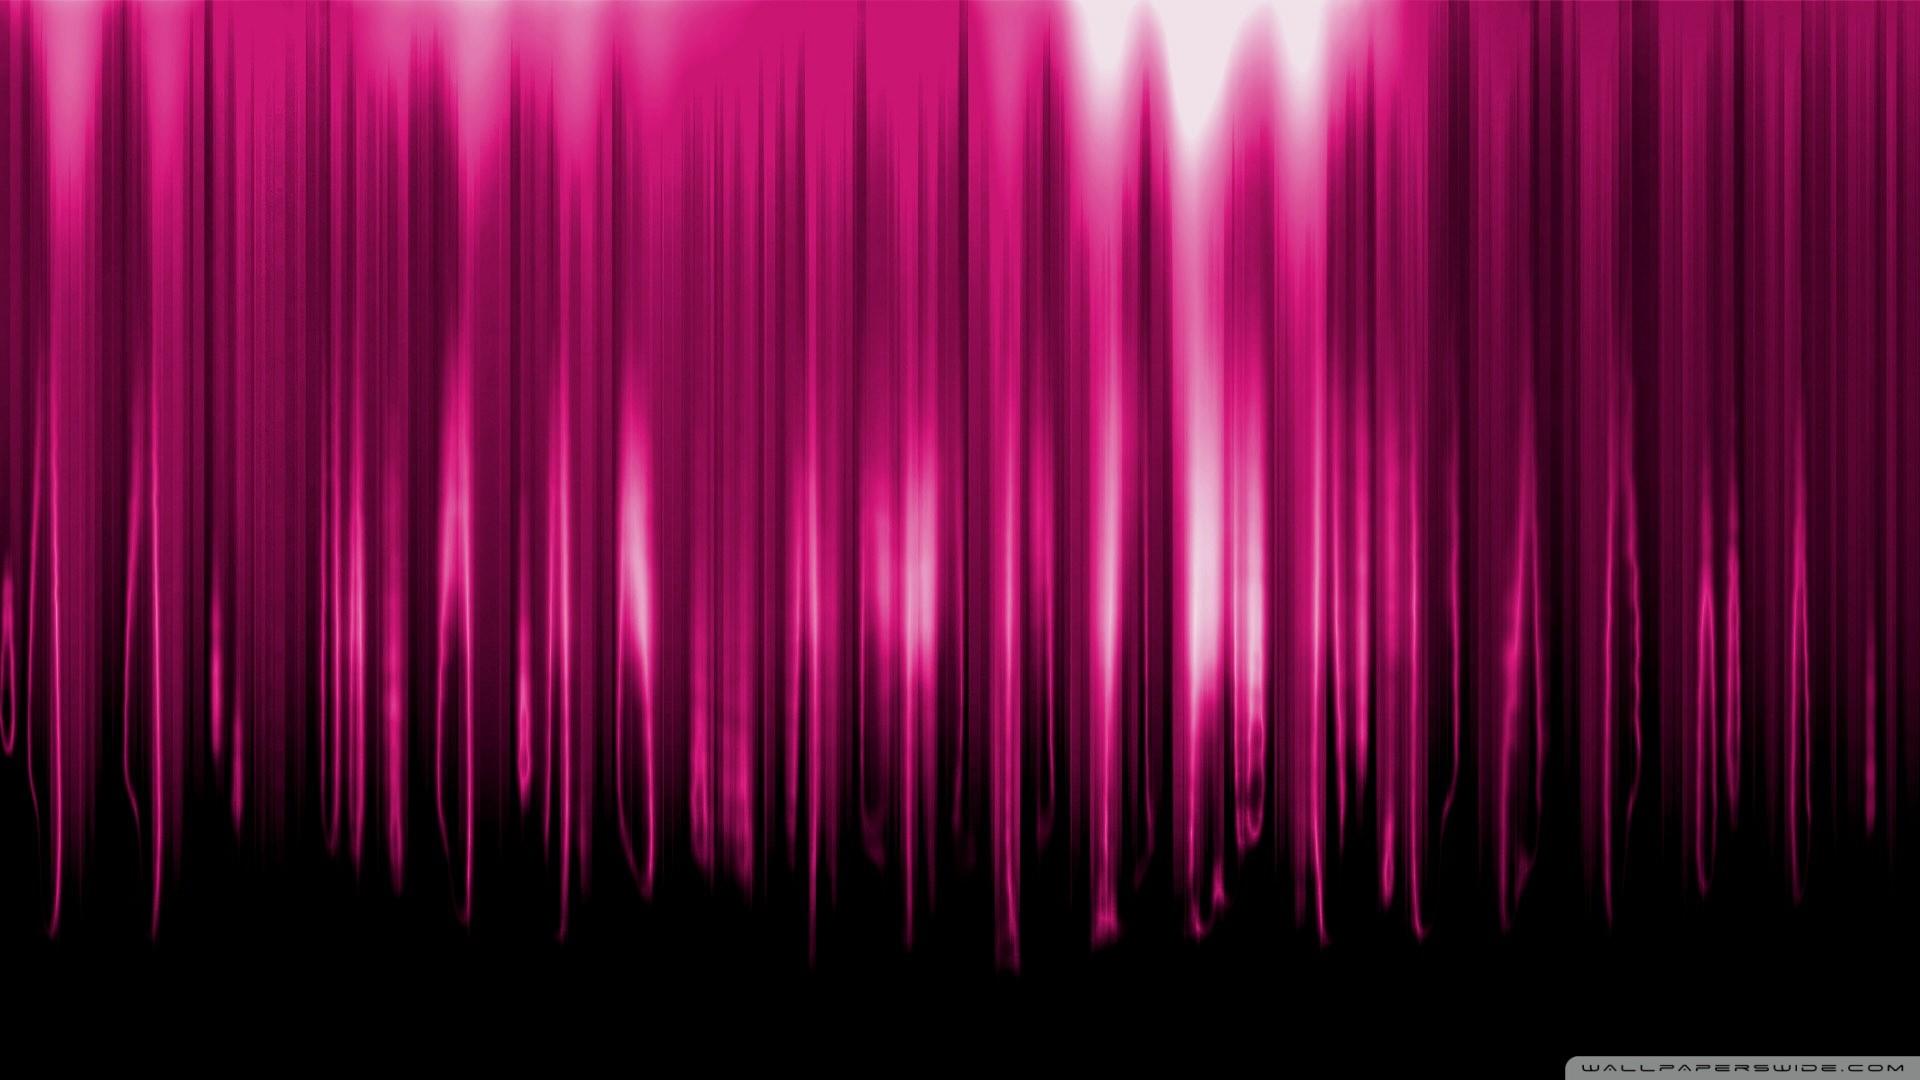 Cool Pink Backgrounds Cool Pink Backgrounds